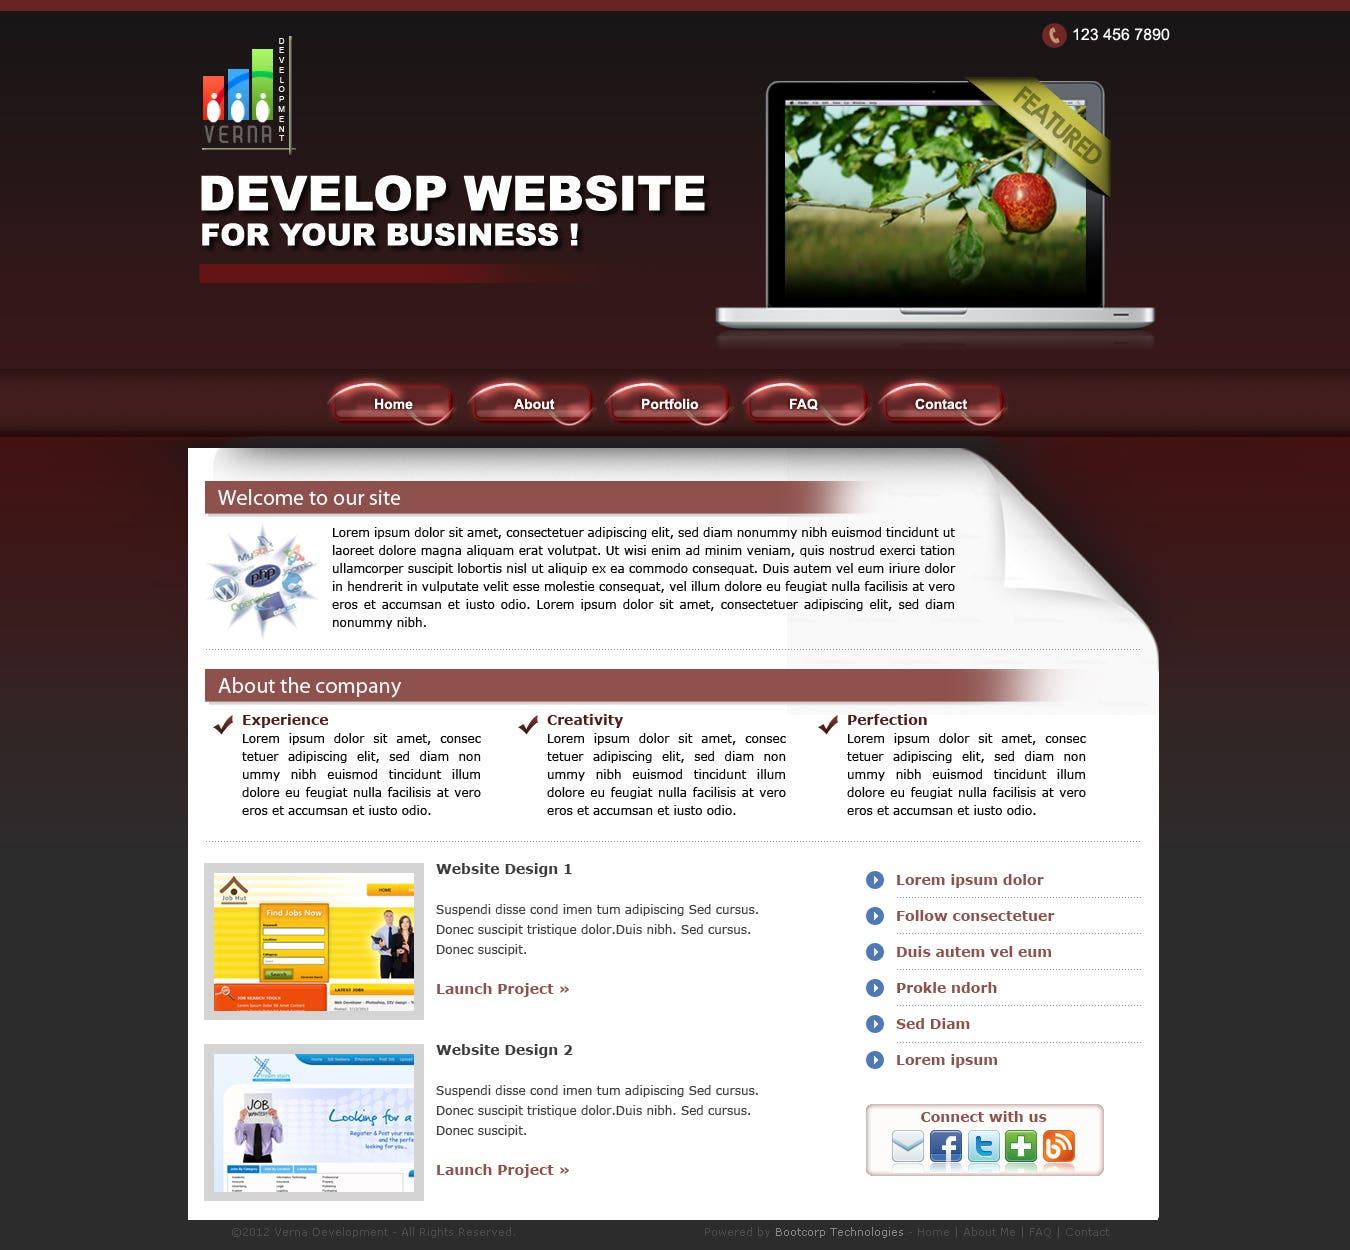 Web Devlopment Company Template